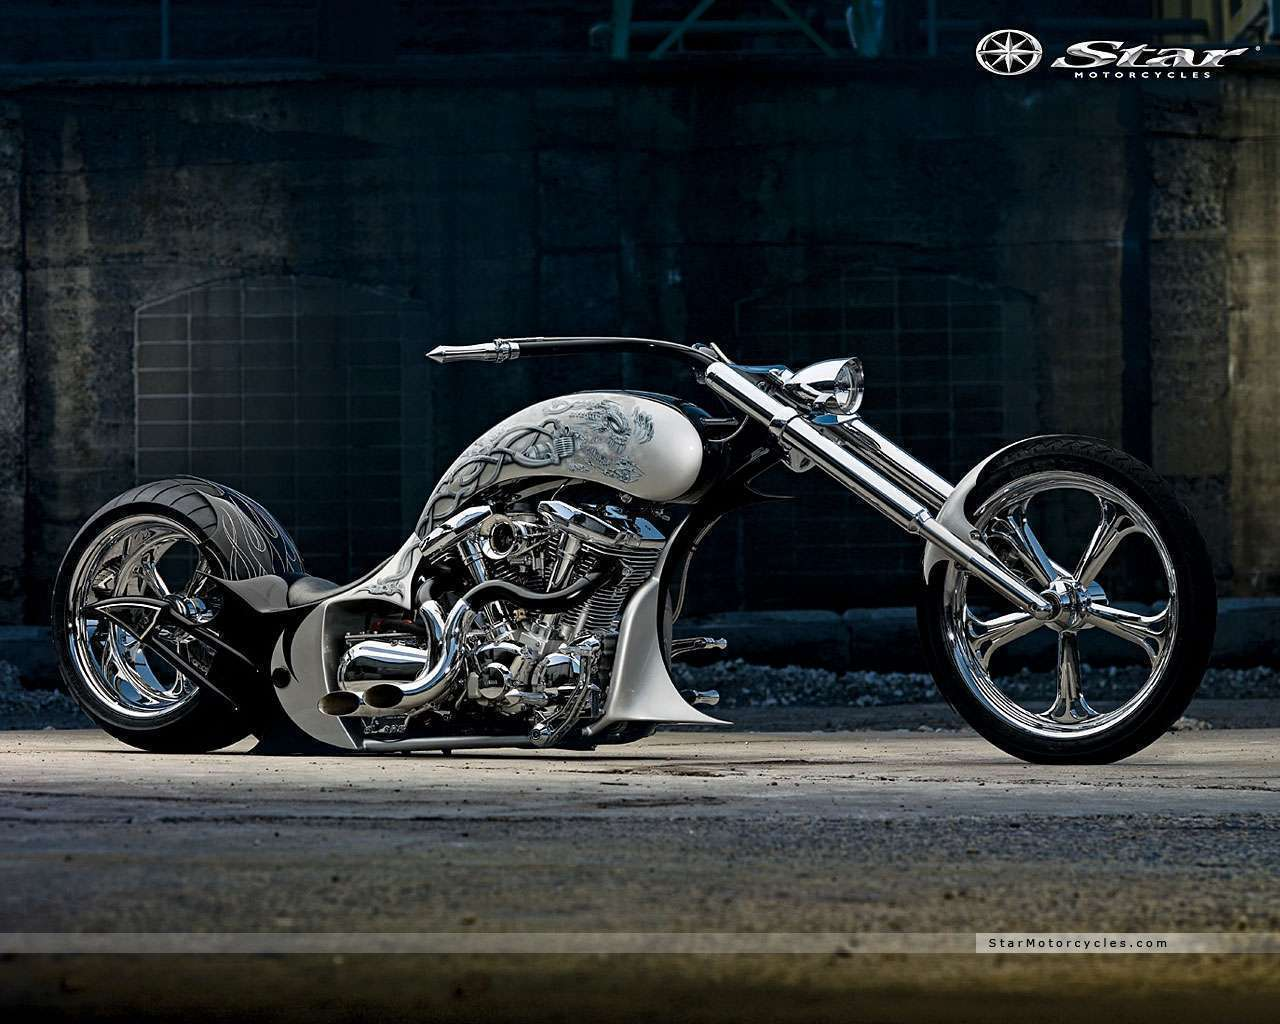 Cool Custom Bike Wallpaper Hd Car Wallpapers 1280x1024